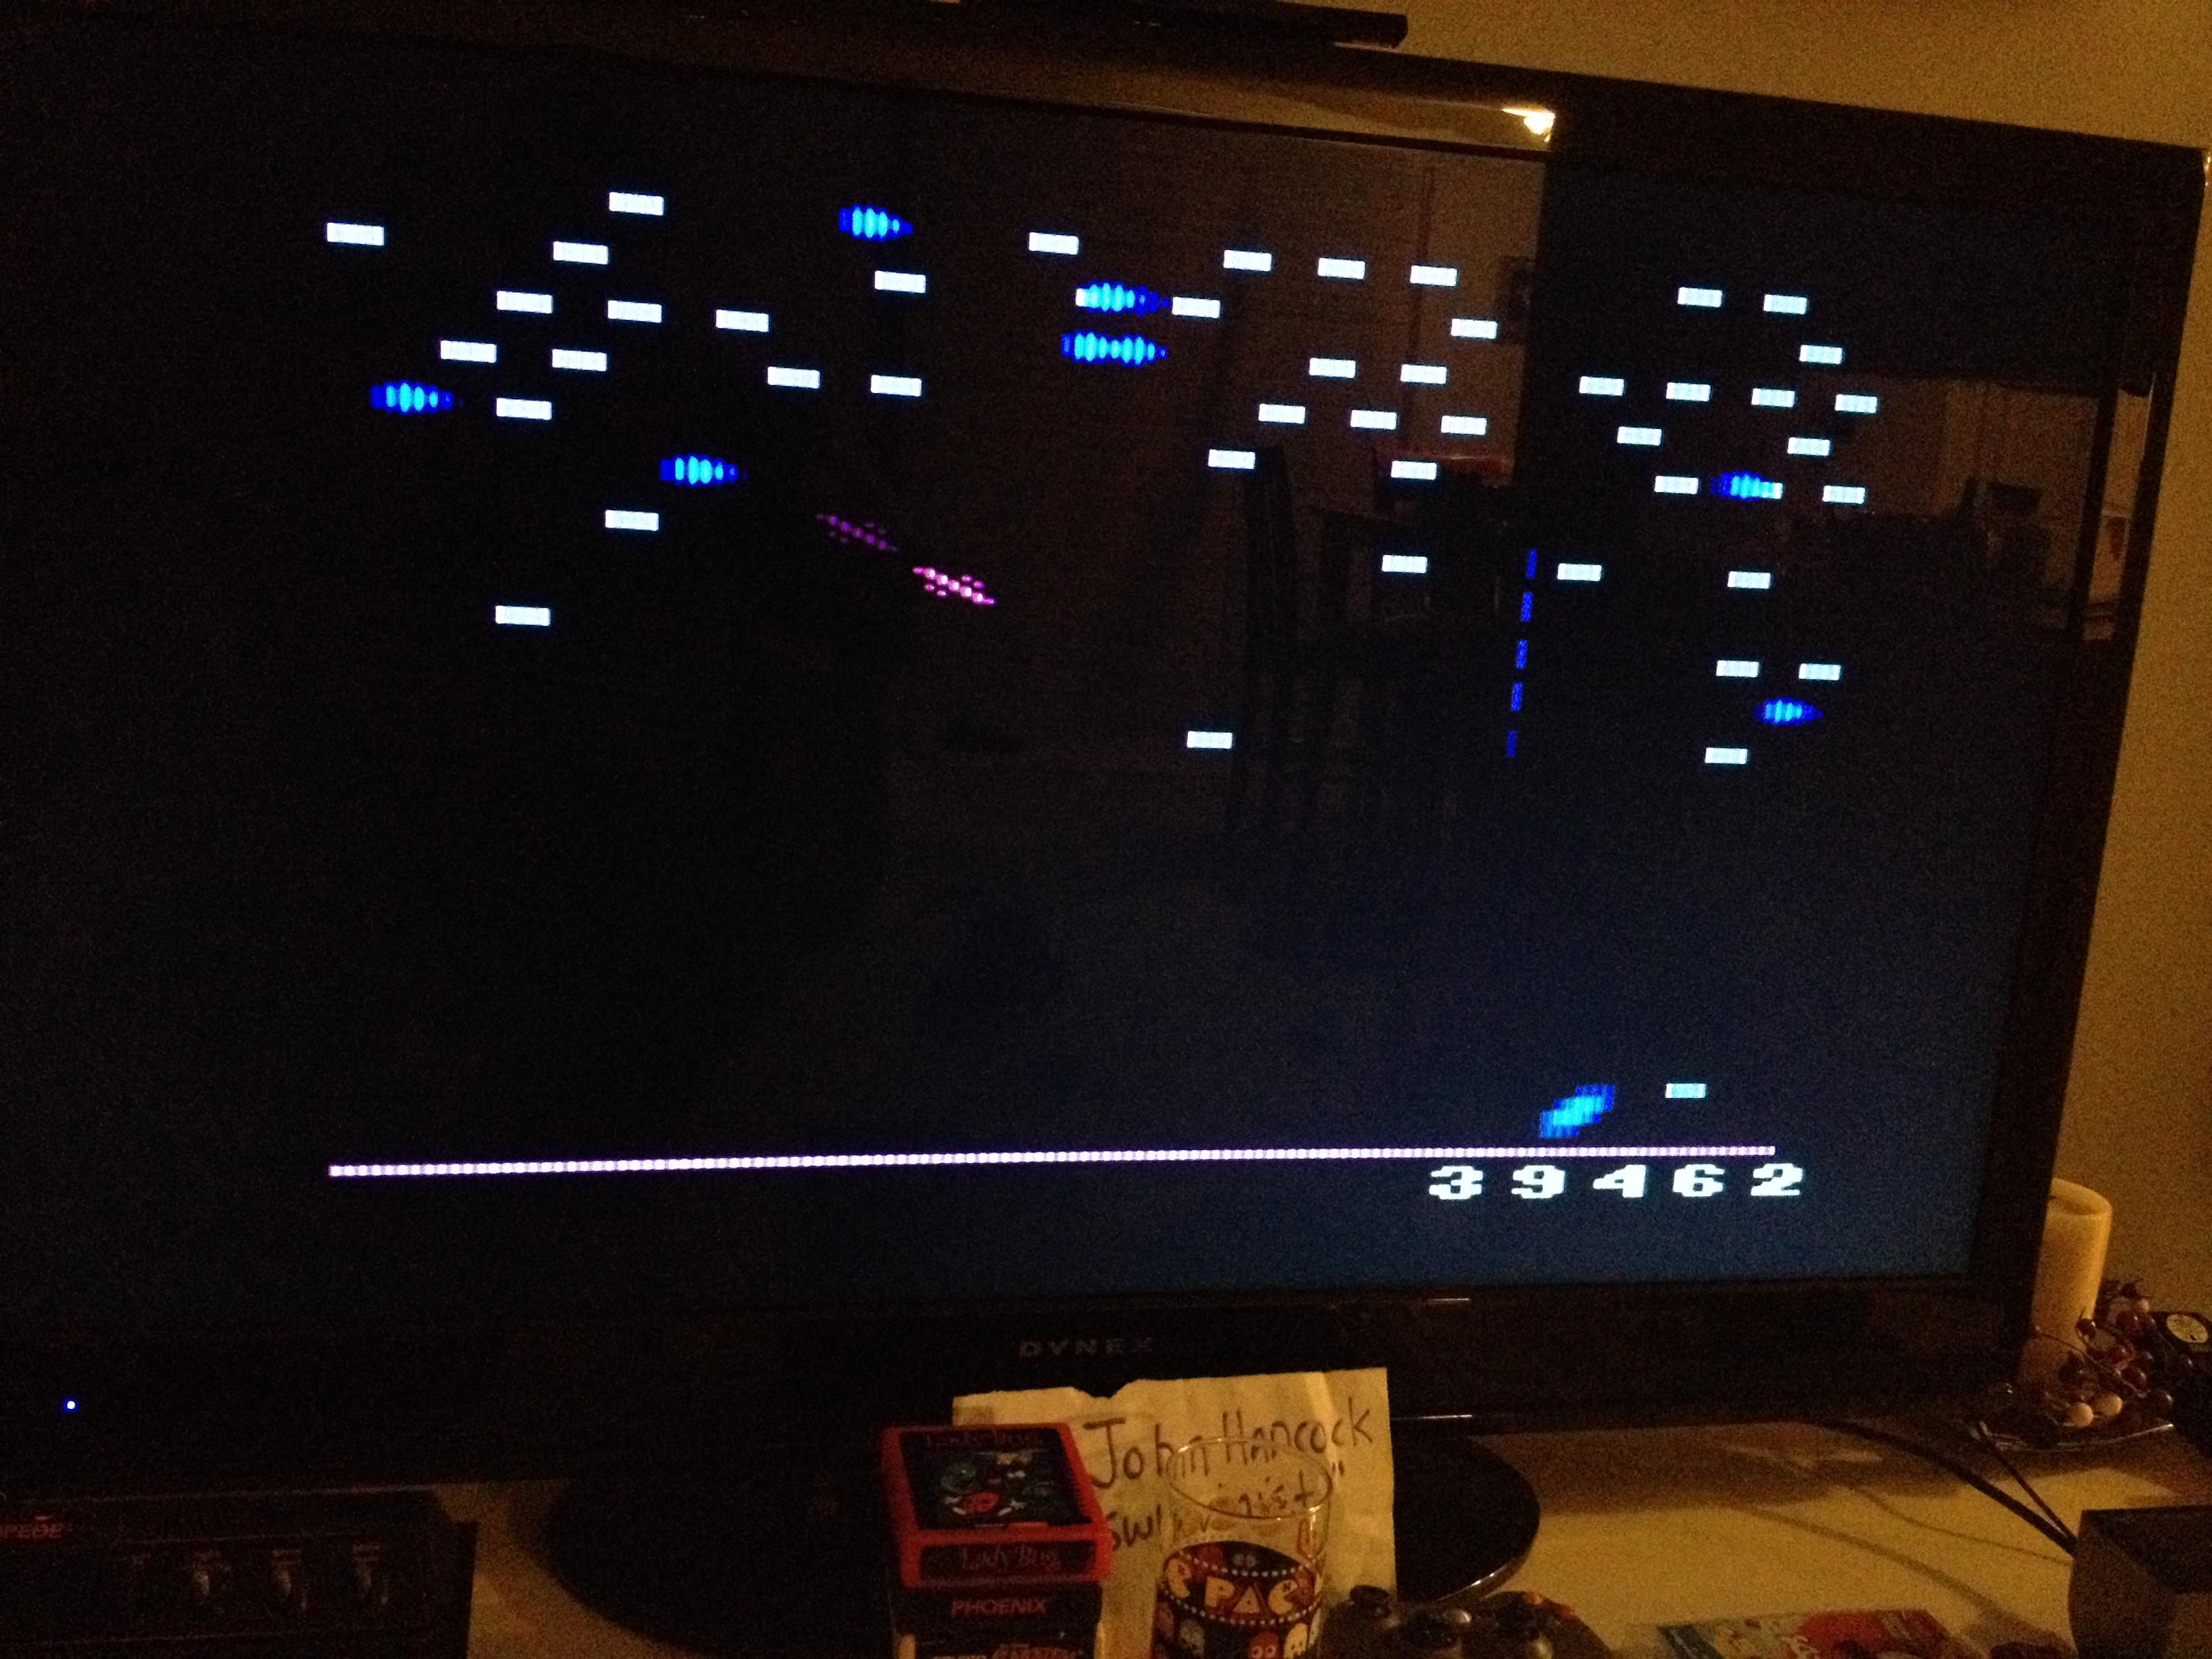 swlovinist: Millipede (Atari 2600 Expert/A) 39,462 points on 2013-10-02 00:28:40